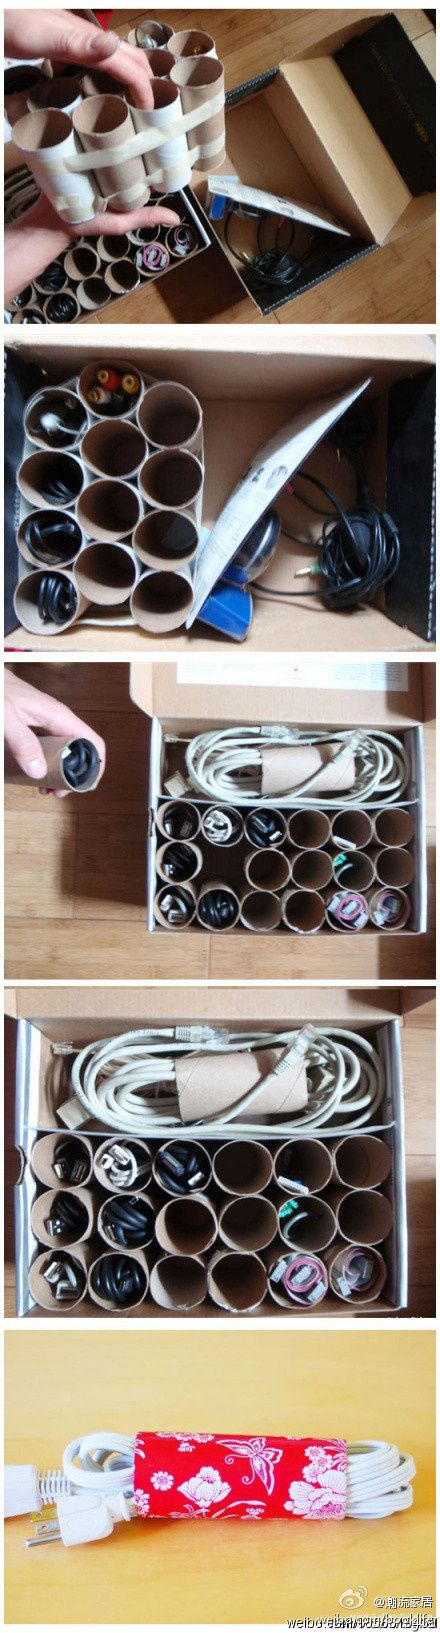 Rabbit Hawker - DIY handmade> waste utilization is very simple